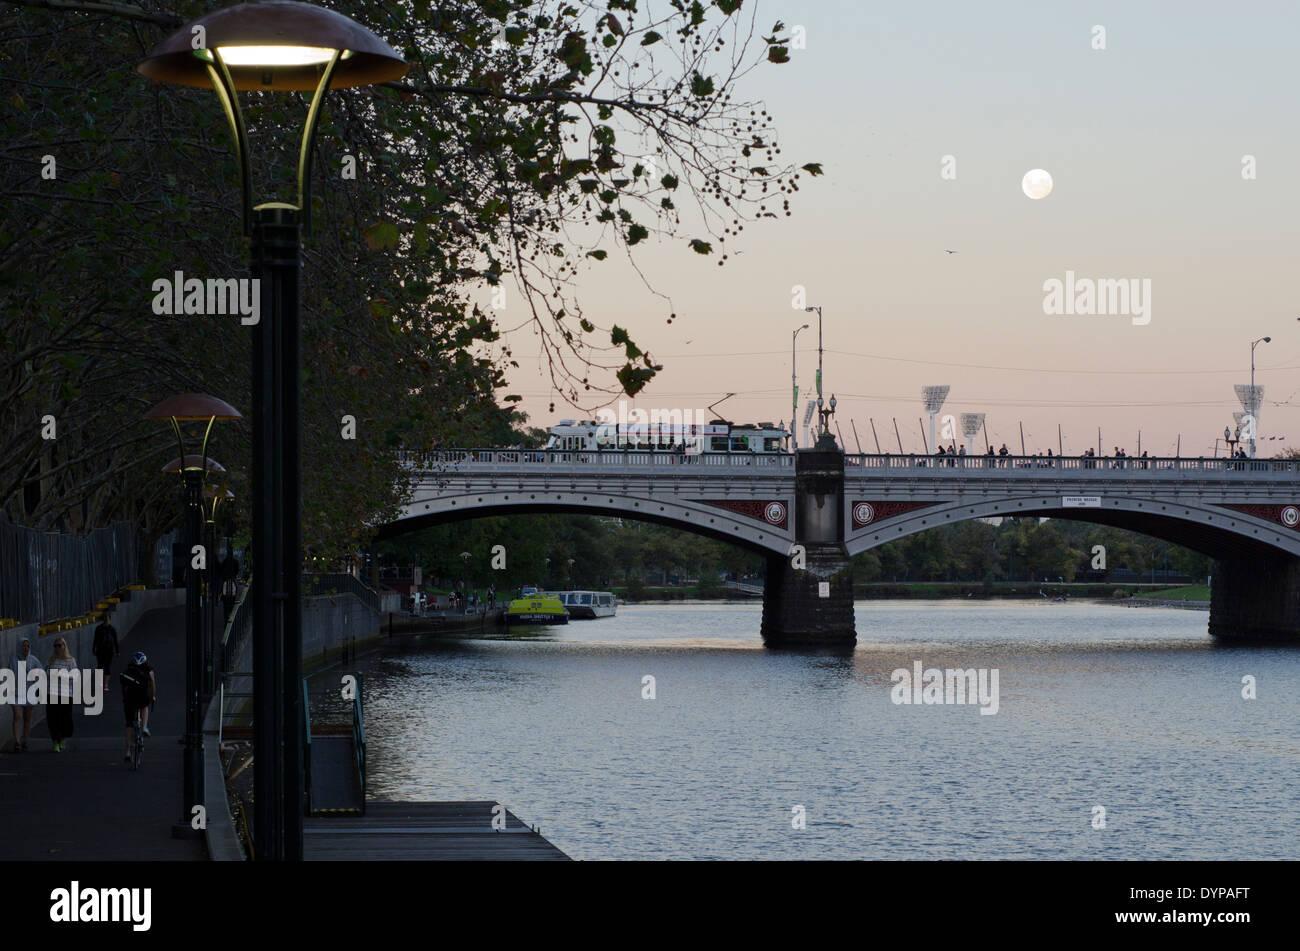 Princes Bridge Melbourne Victoria Australia AUS - Stock Image